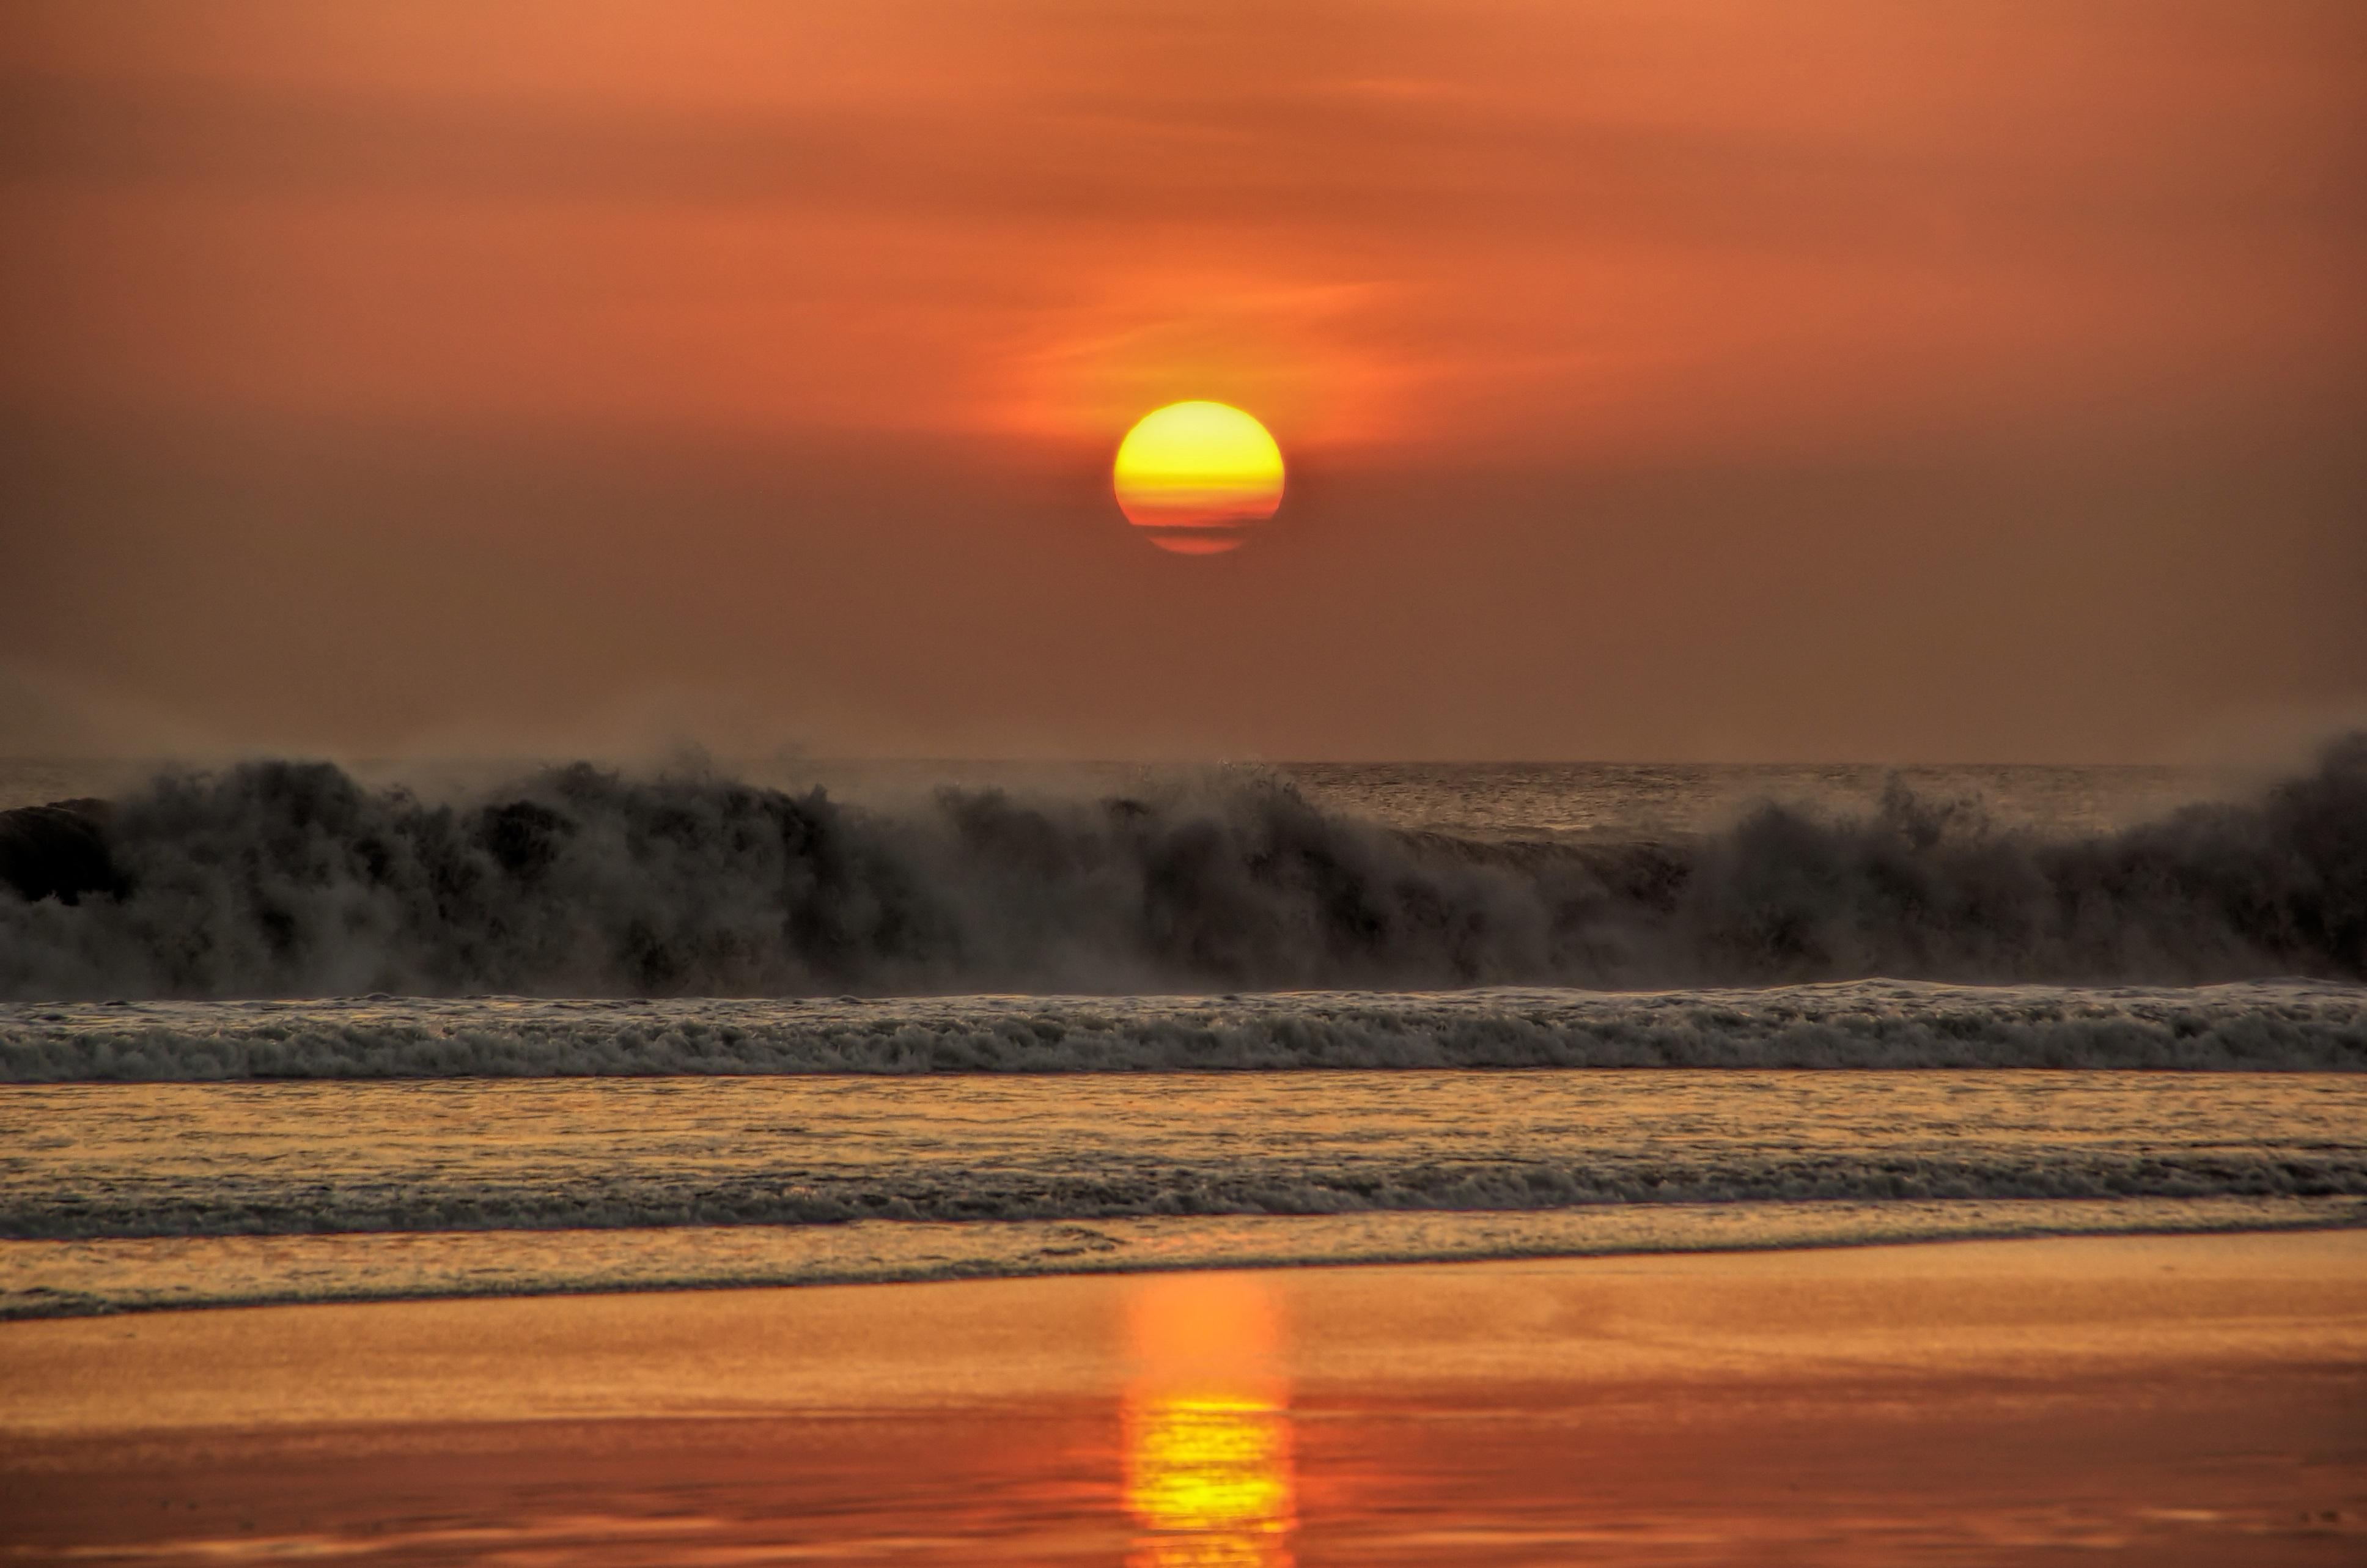 sunset-1337686